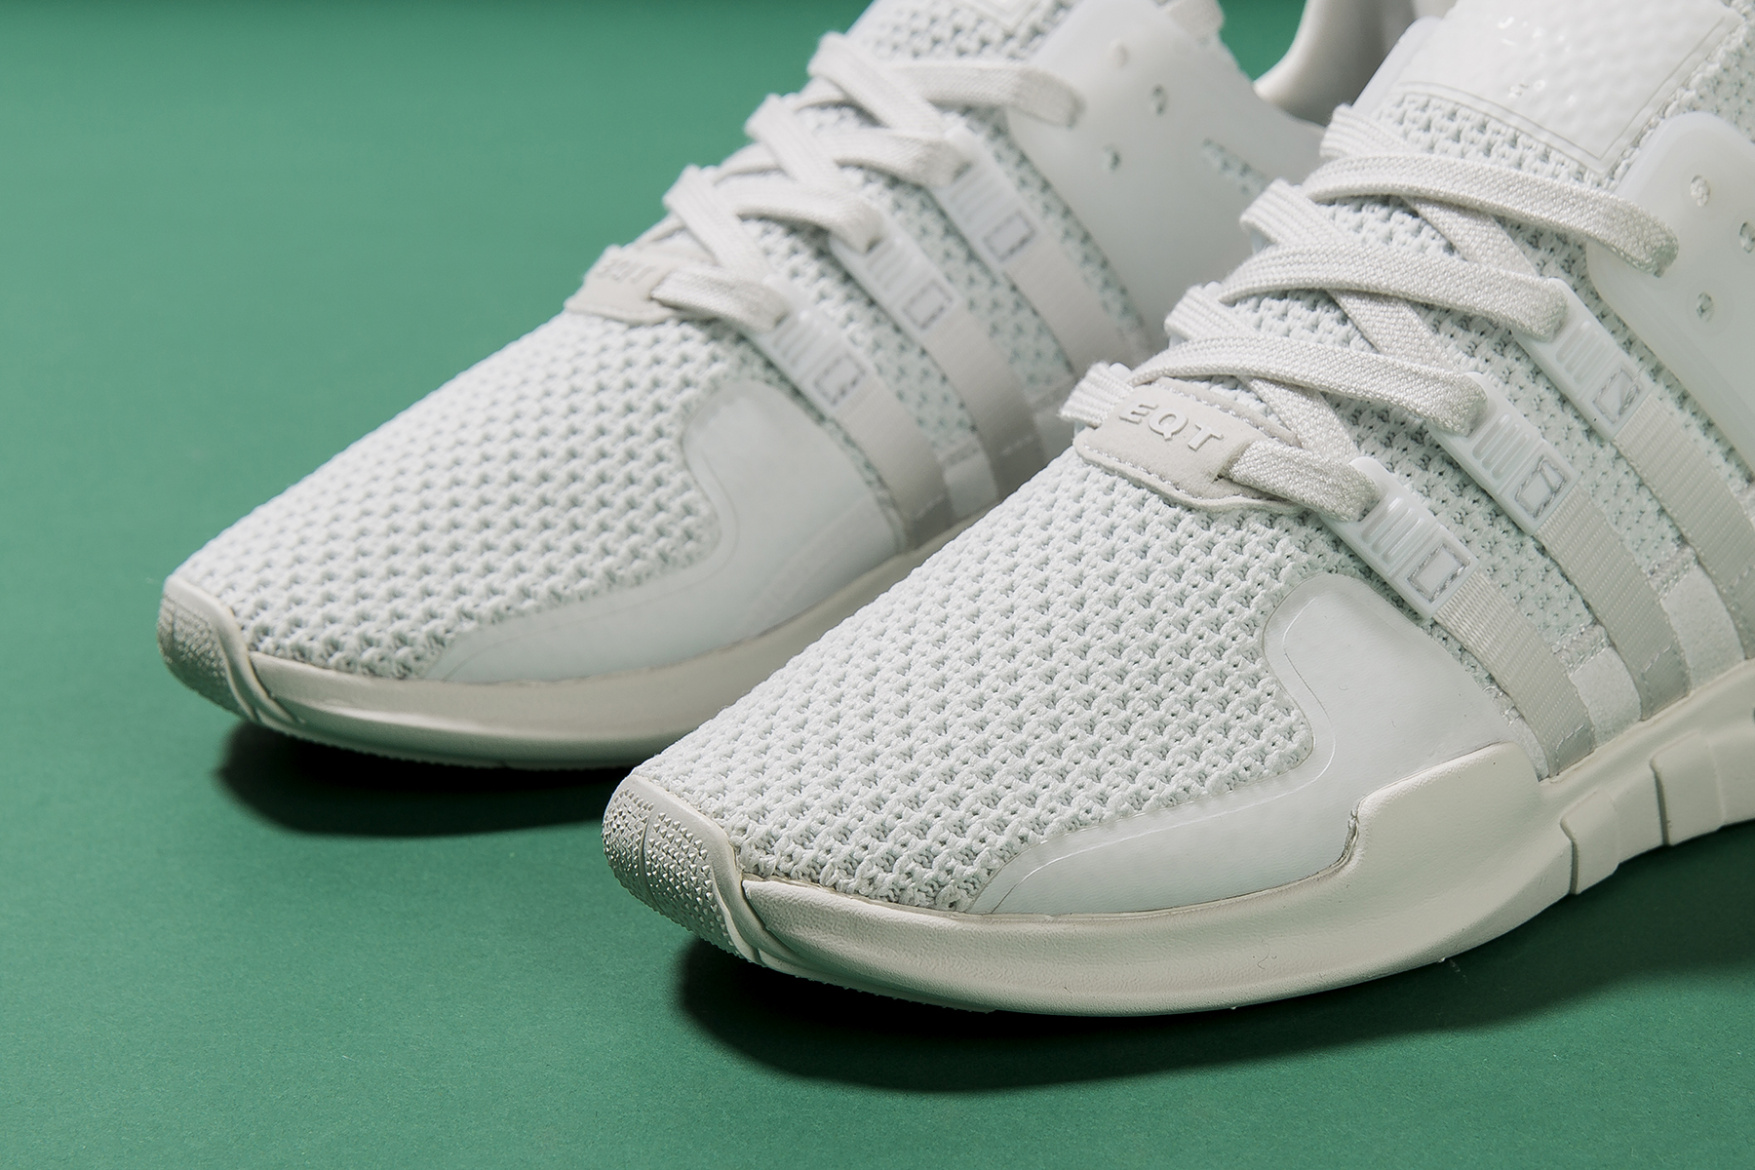 adidas-eqt-support-adv-vintage-white-2.jpg